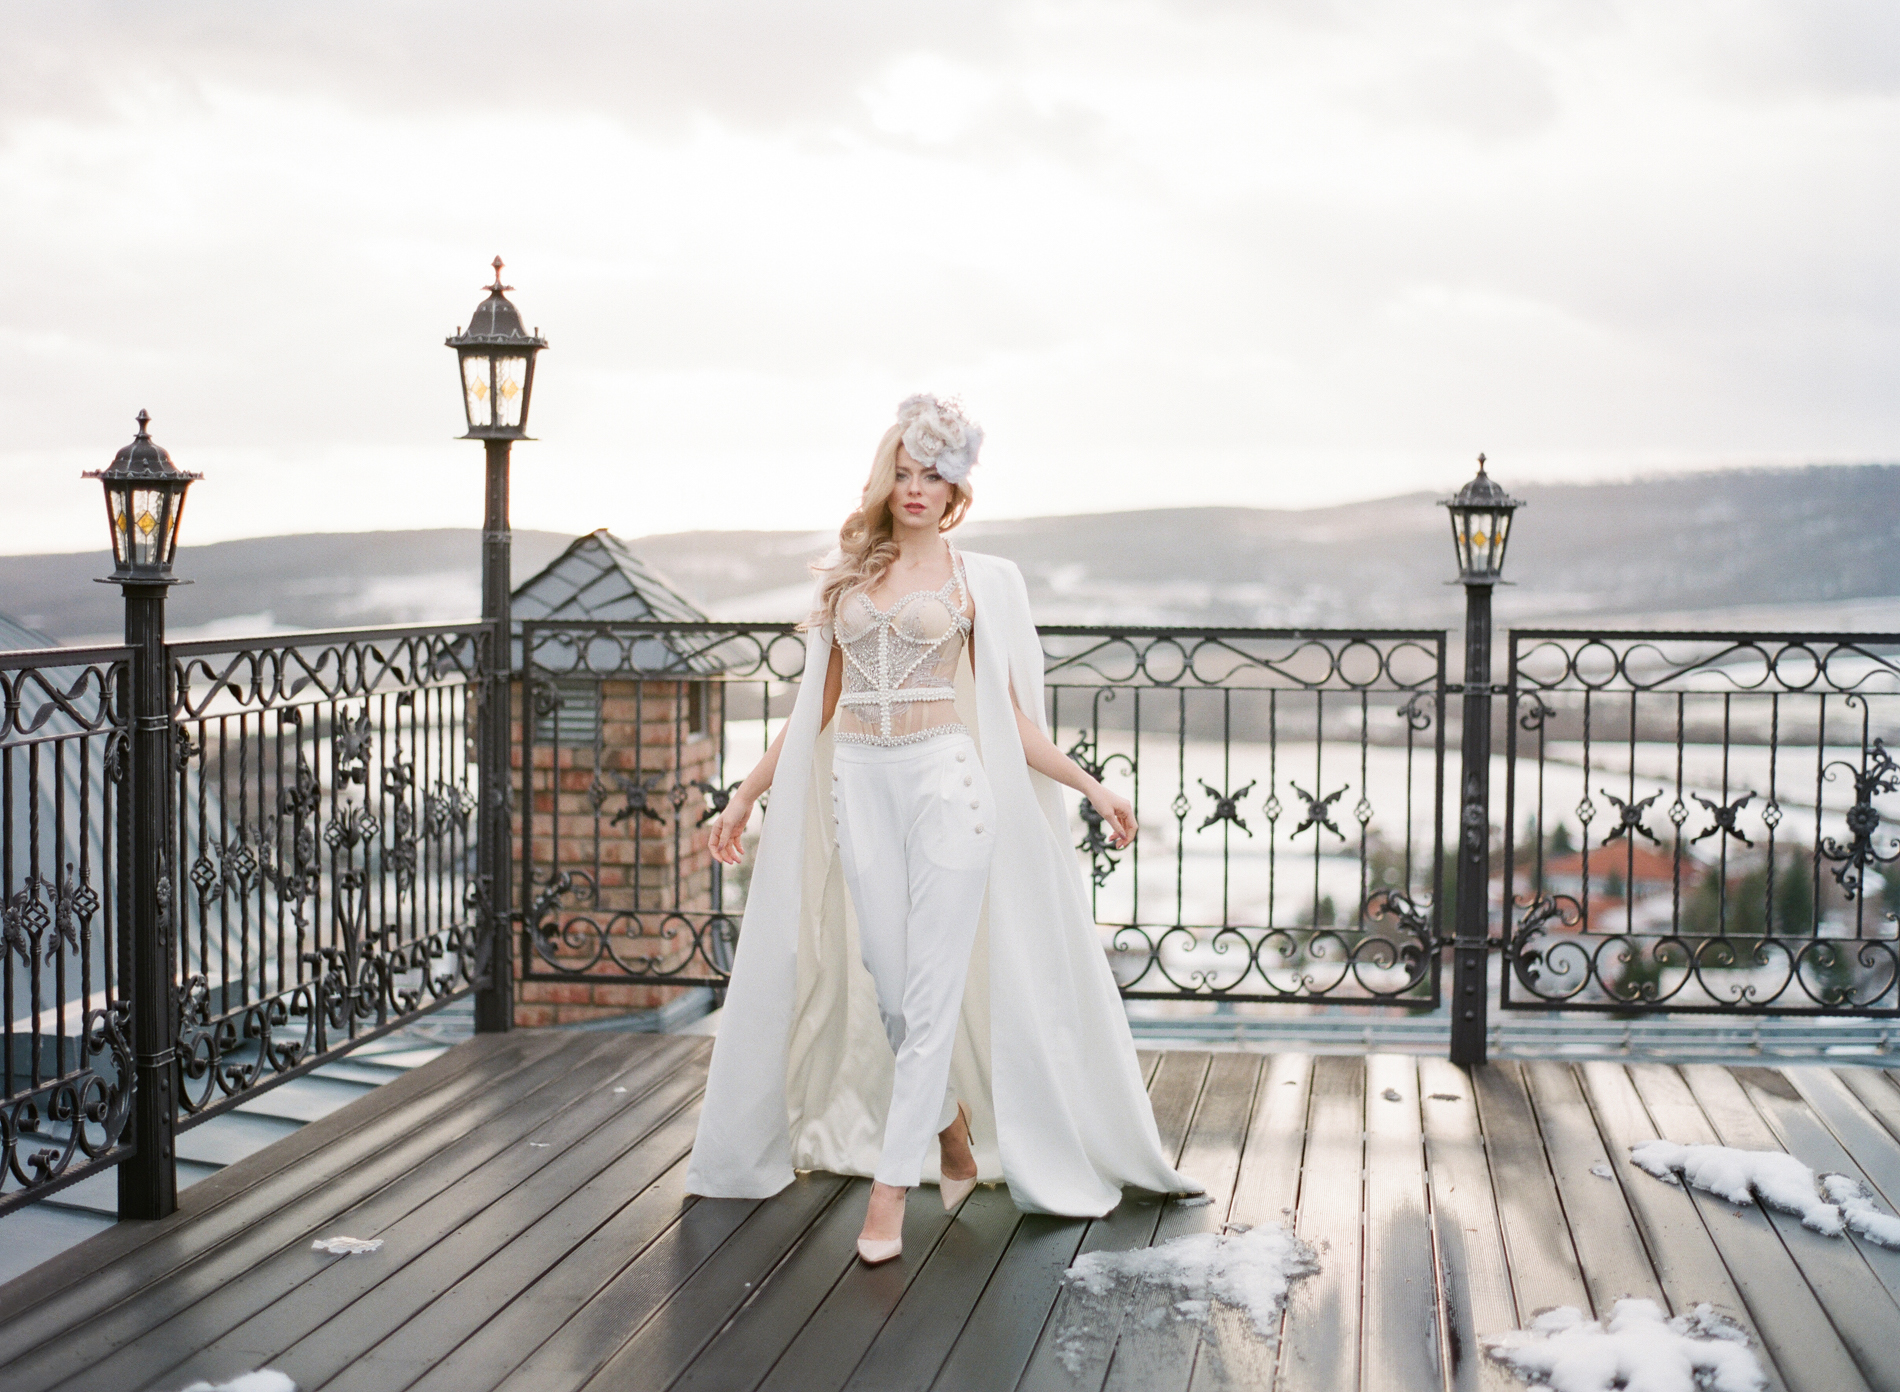 galicia_nueva_wedding_photographer_nikol_bodnarova_italy_wedding_photographer_142.JPG